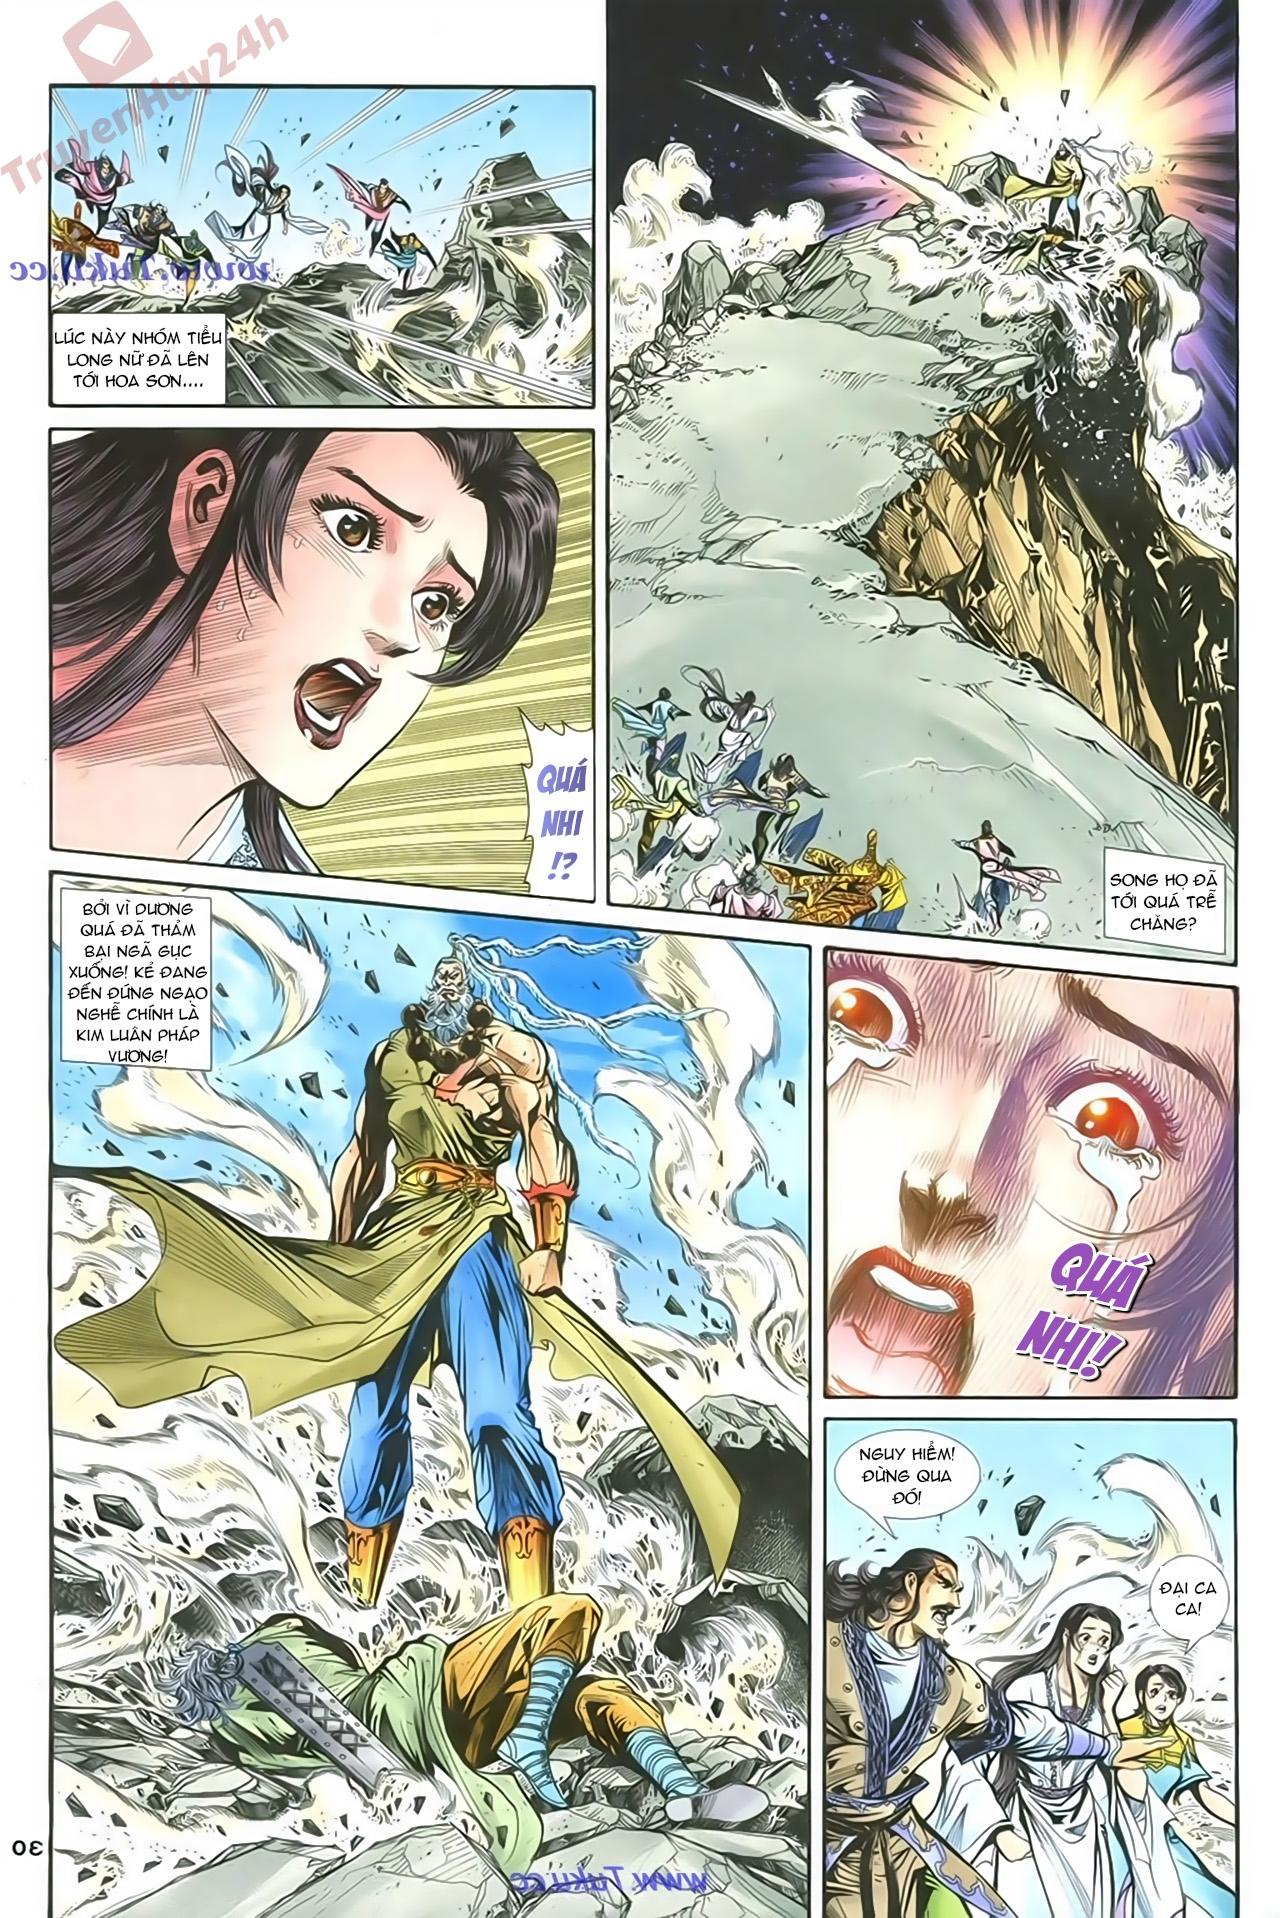 Thần Điêu Hiệp Lữ chap 86 – End Trang 29 - Mangak.info